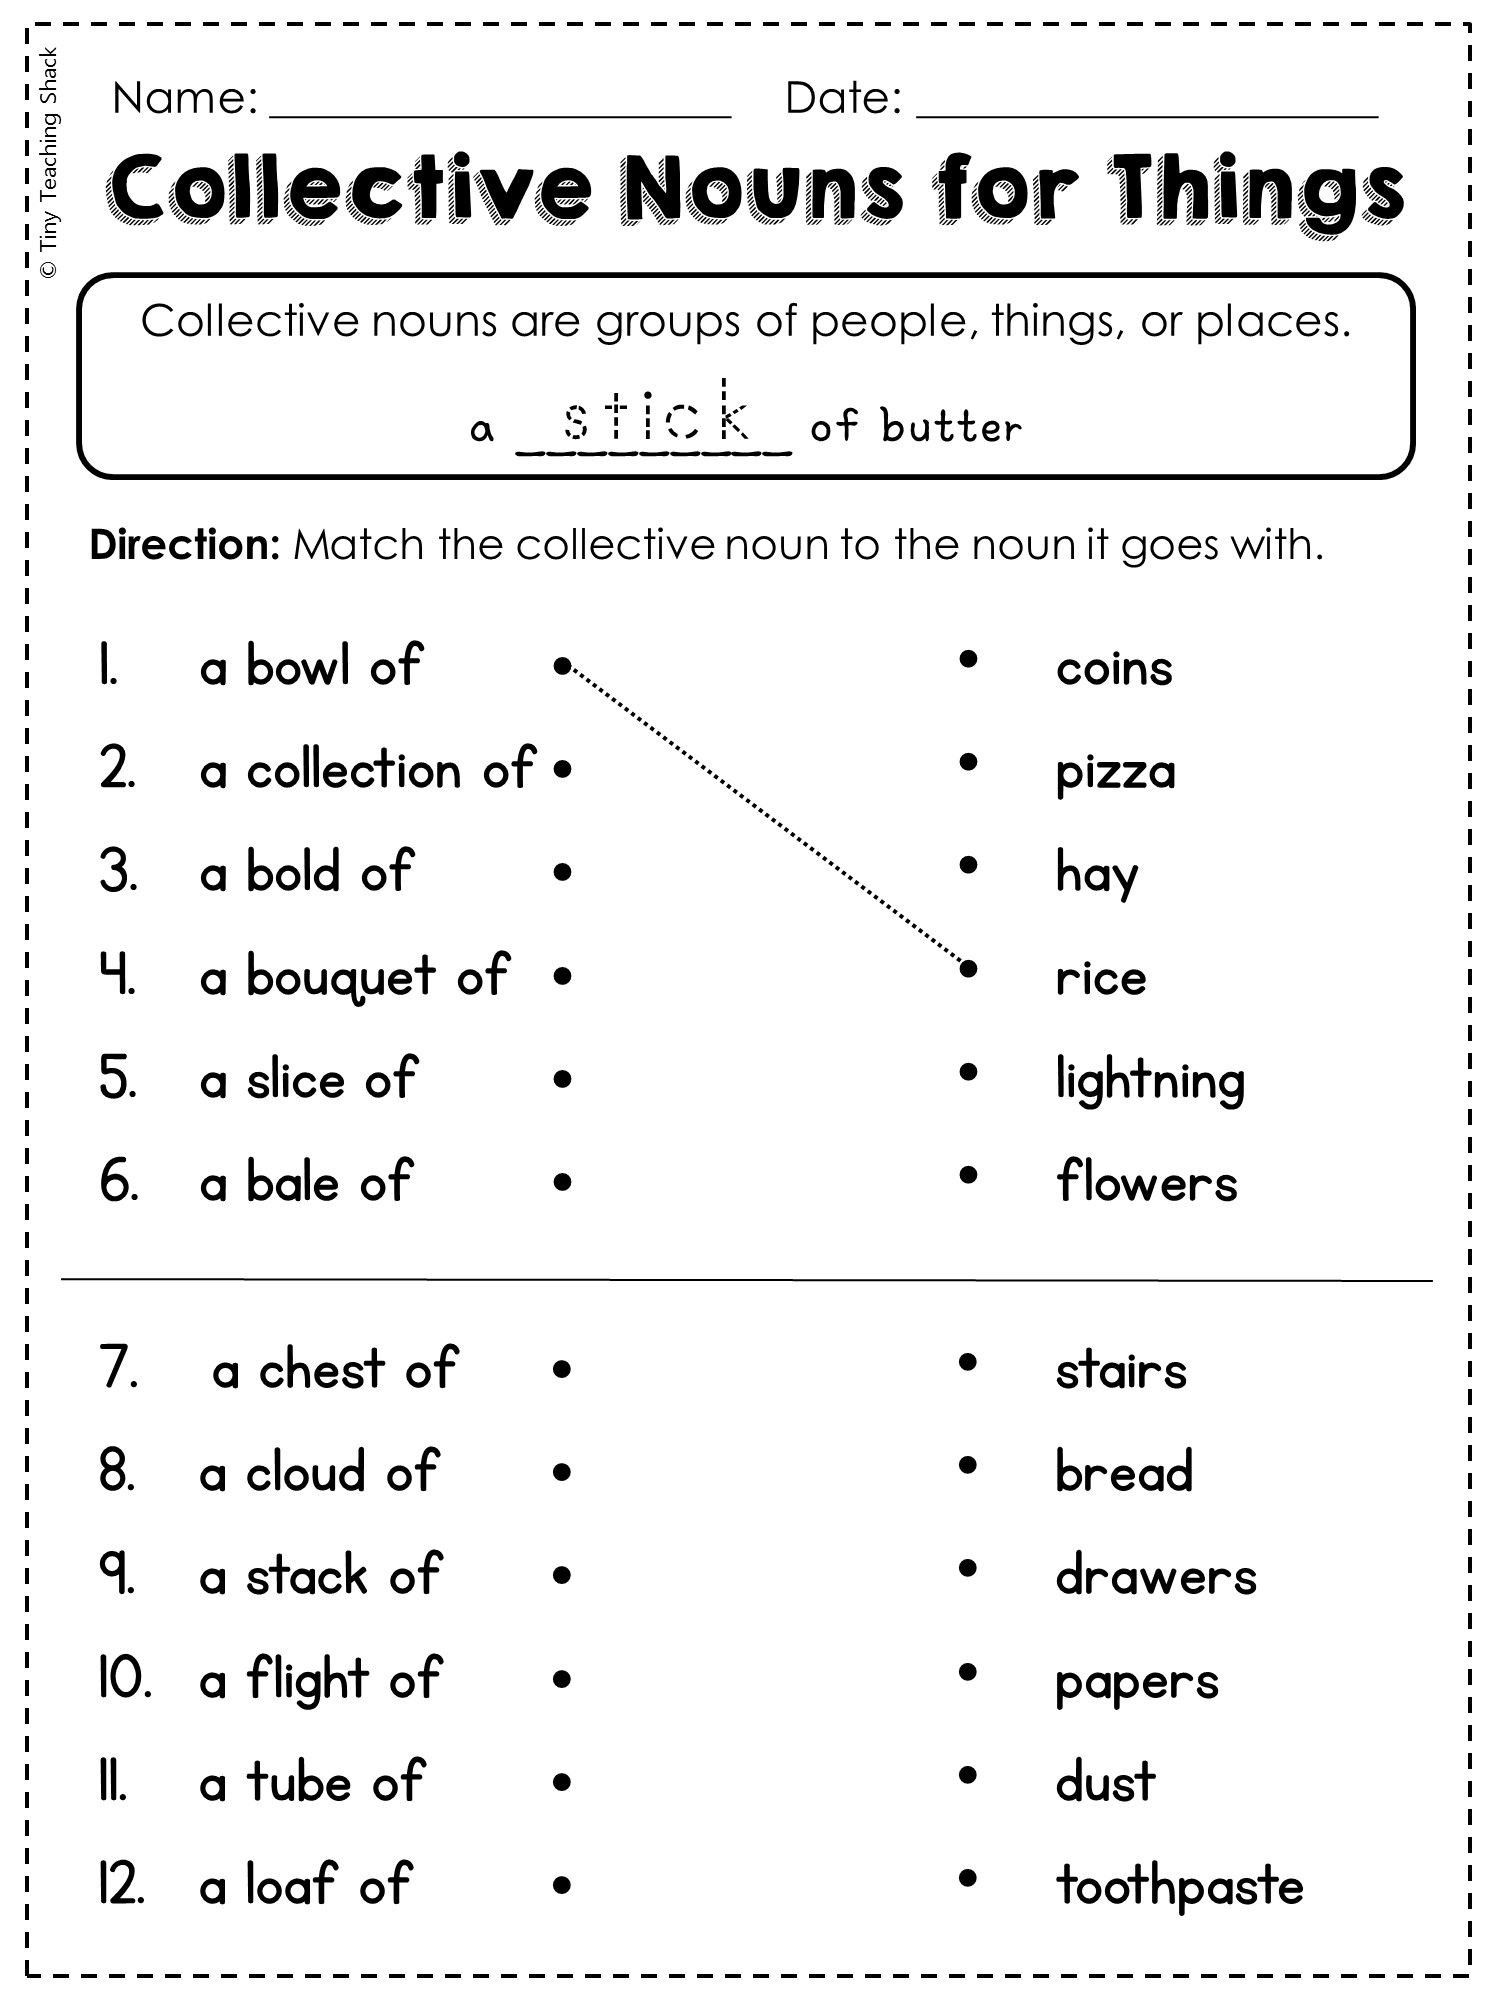 Second Grade Grammar Worksheets 2nd Grade Language Arts And Grammar Practice Sheets Freebie Collective Nouns Worksheet Nouns Worksheet Proper Nouns Worksheet